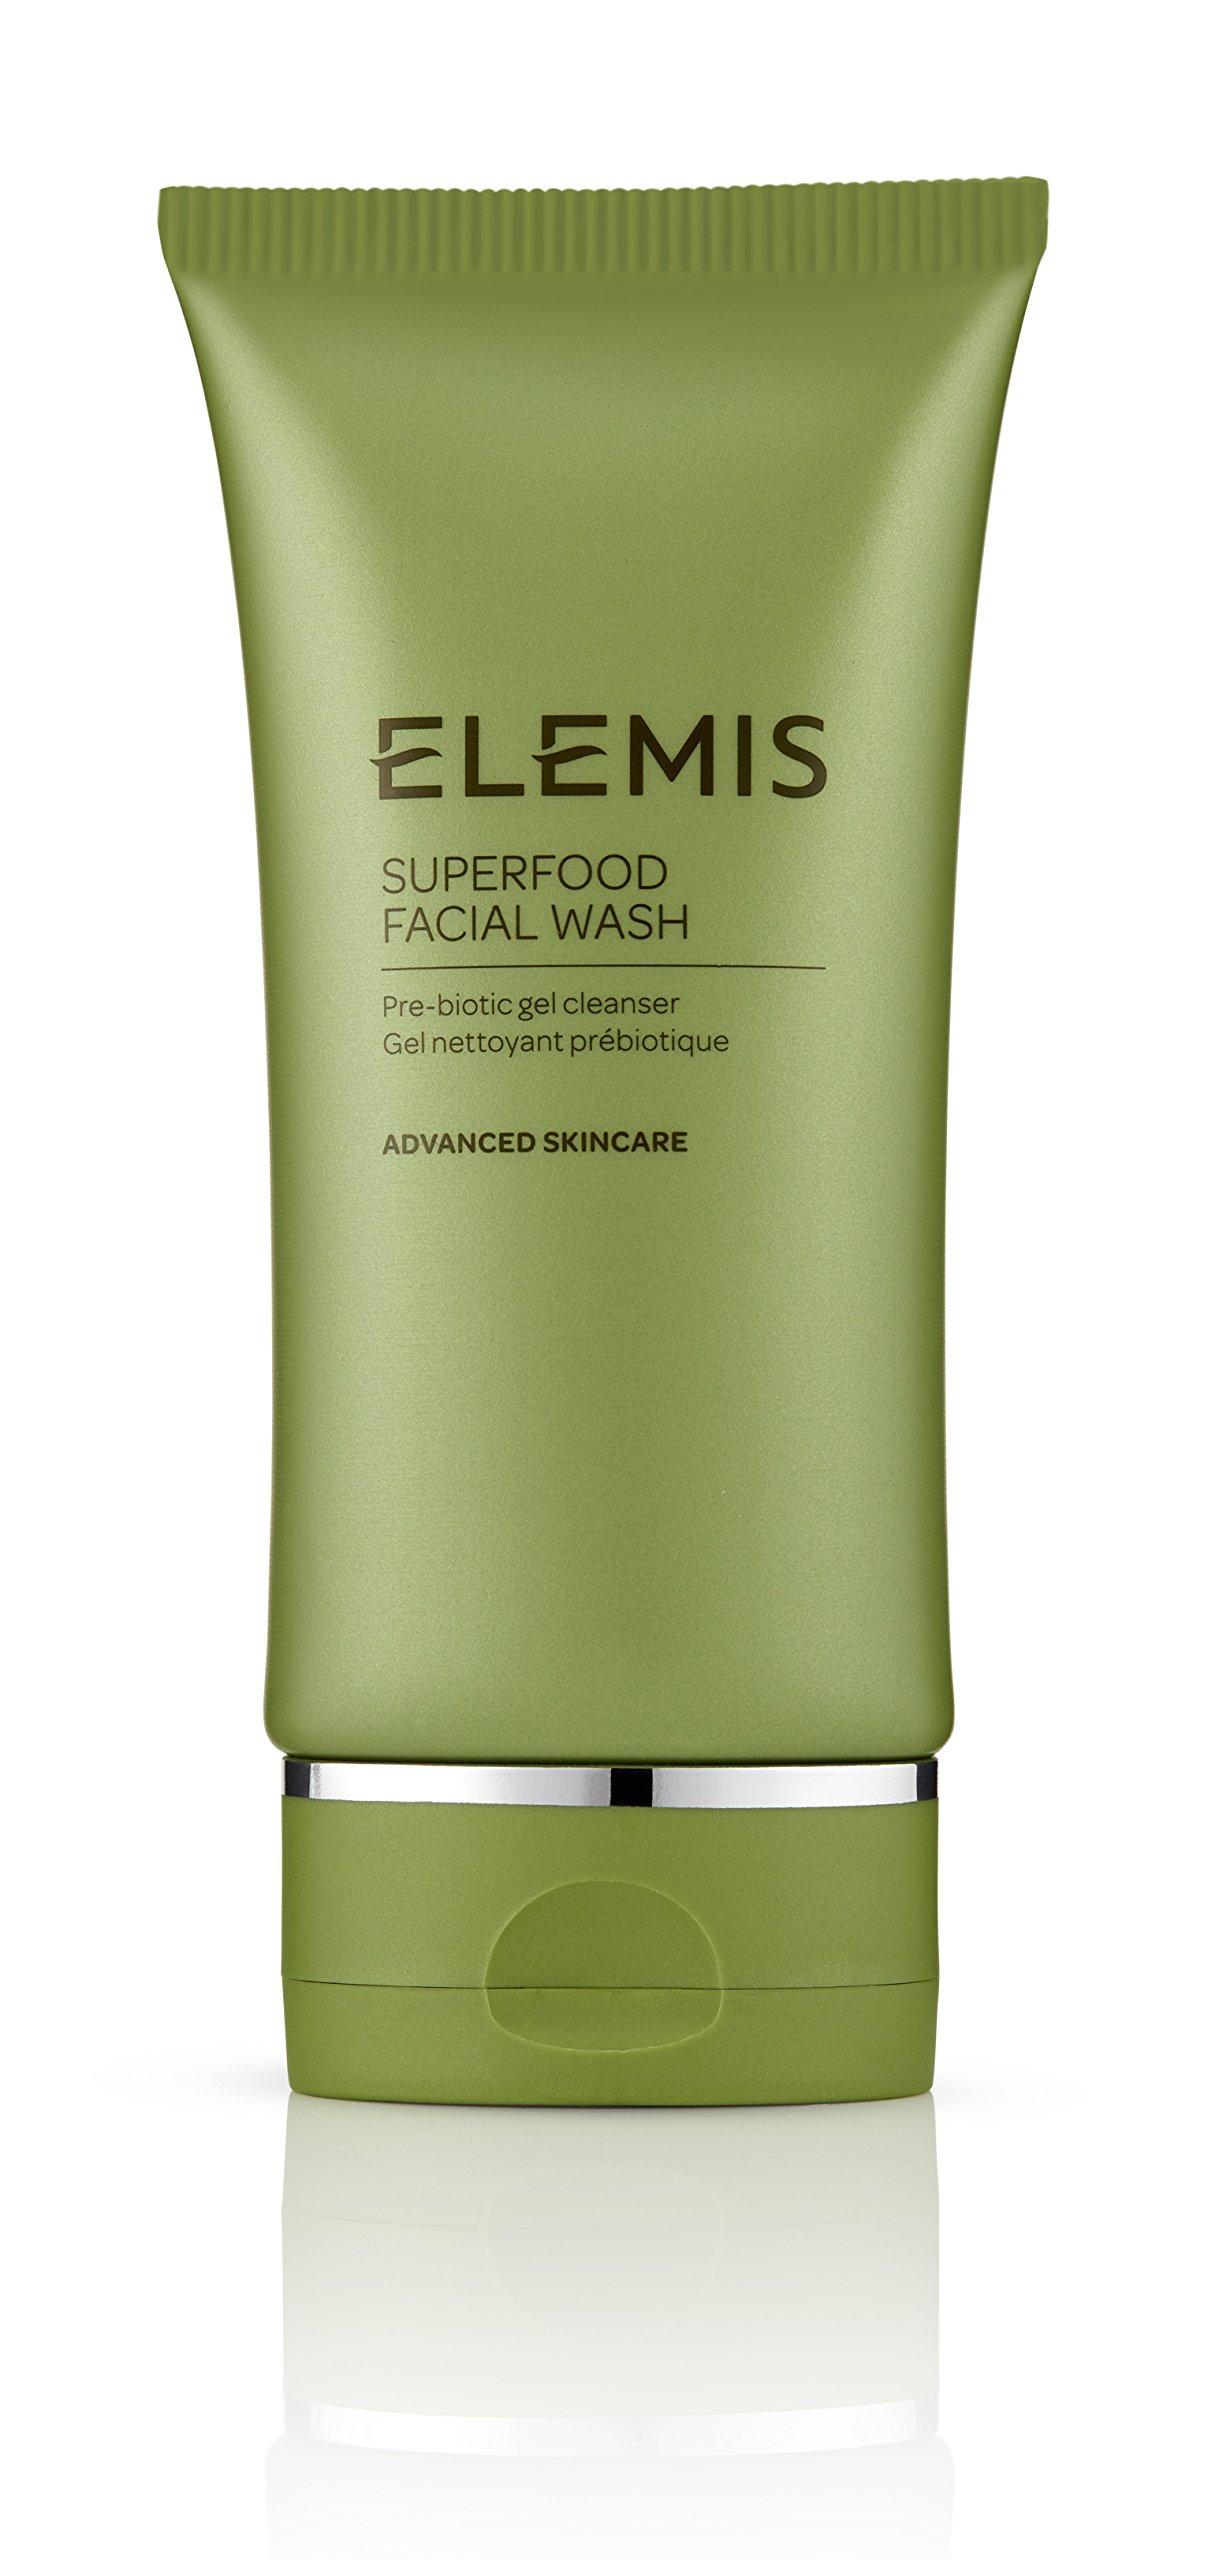 ELEMIS Superfood Facial Wash - Nourishing, Nutrient-dense Gel Cleanser, 5 fl. oz.